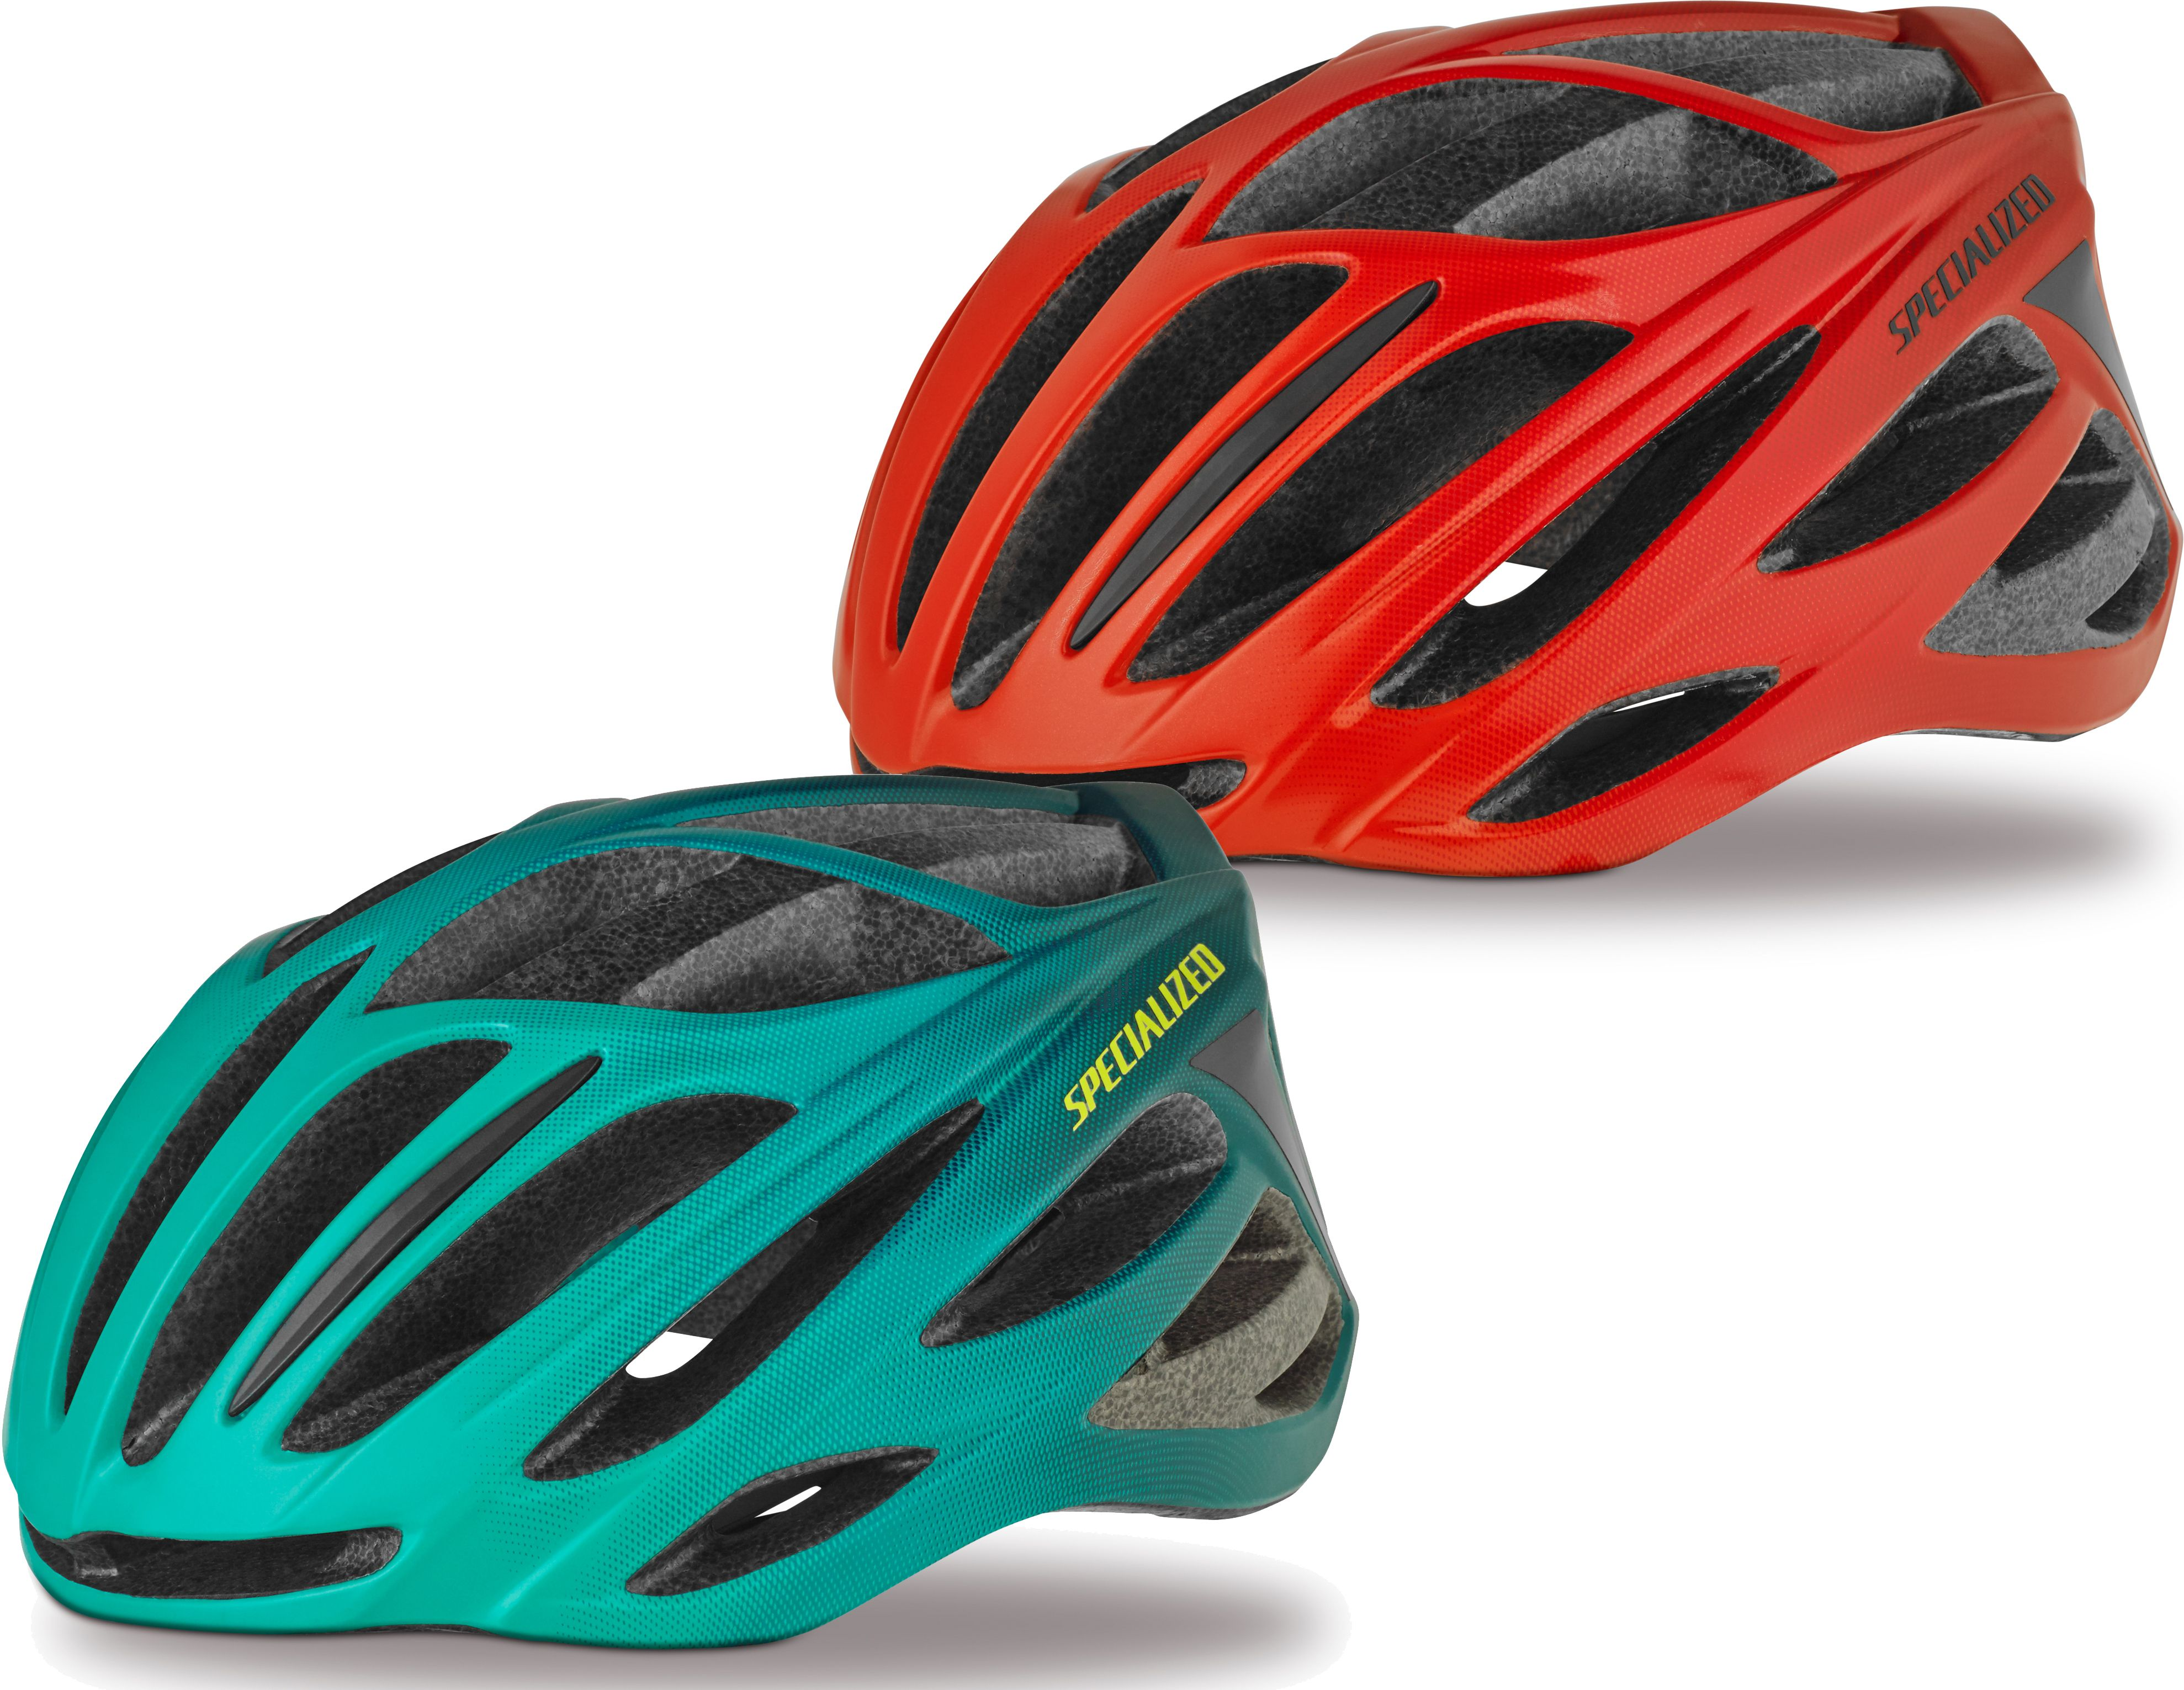 various styles best loved arrives Specialized Echelon 2 Helmet Small Only - £34.99 | Helmets - Mens ...